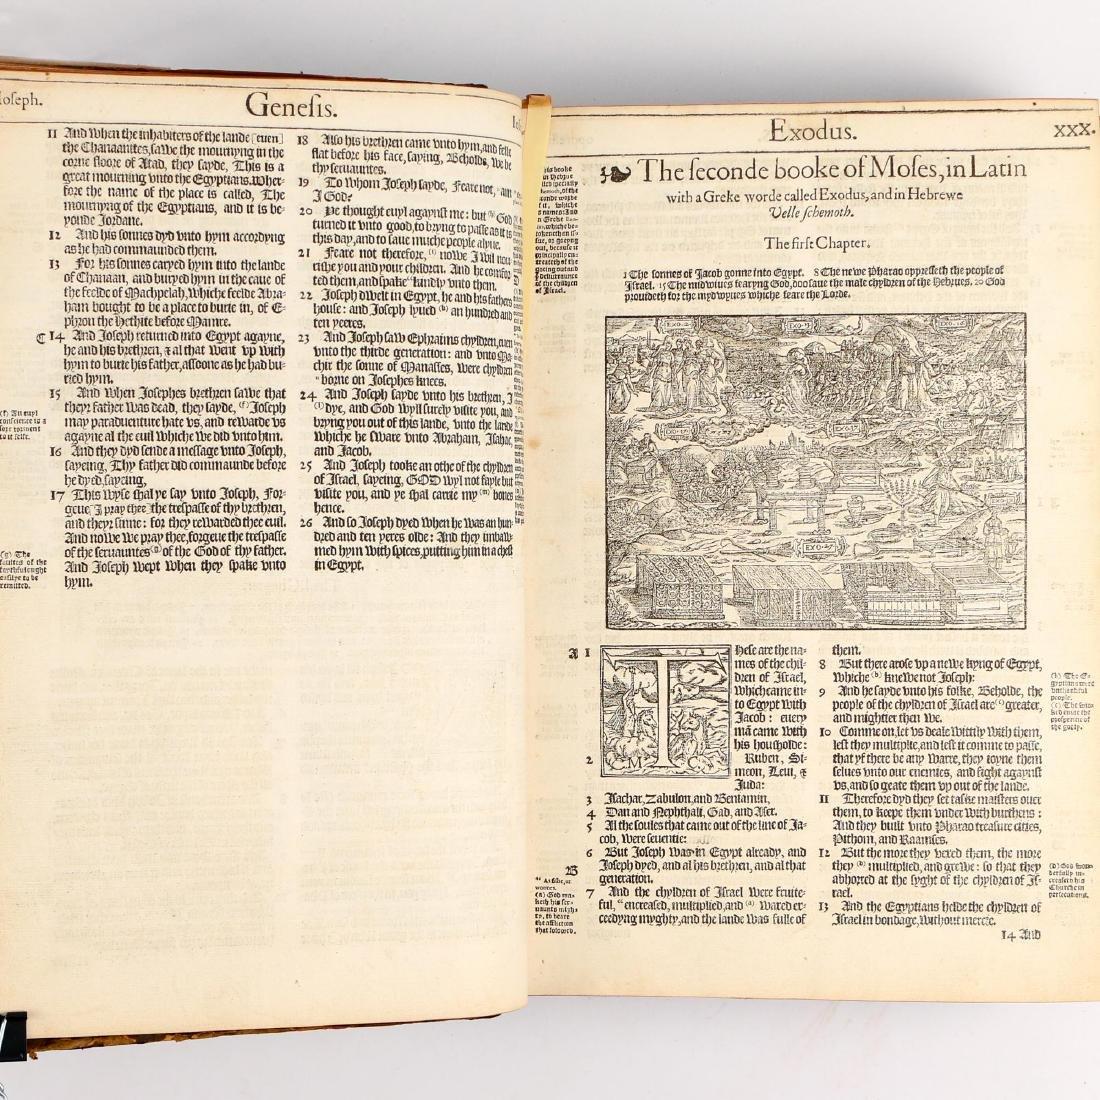 [FRANCIS FRY COPY] BISHOPS' BIBLE [1572] - 16